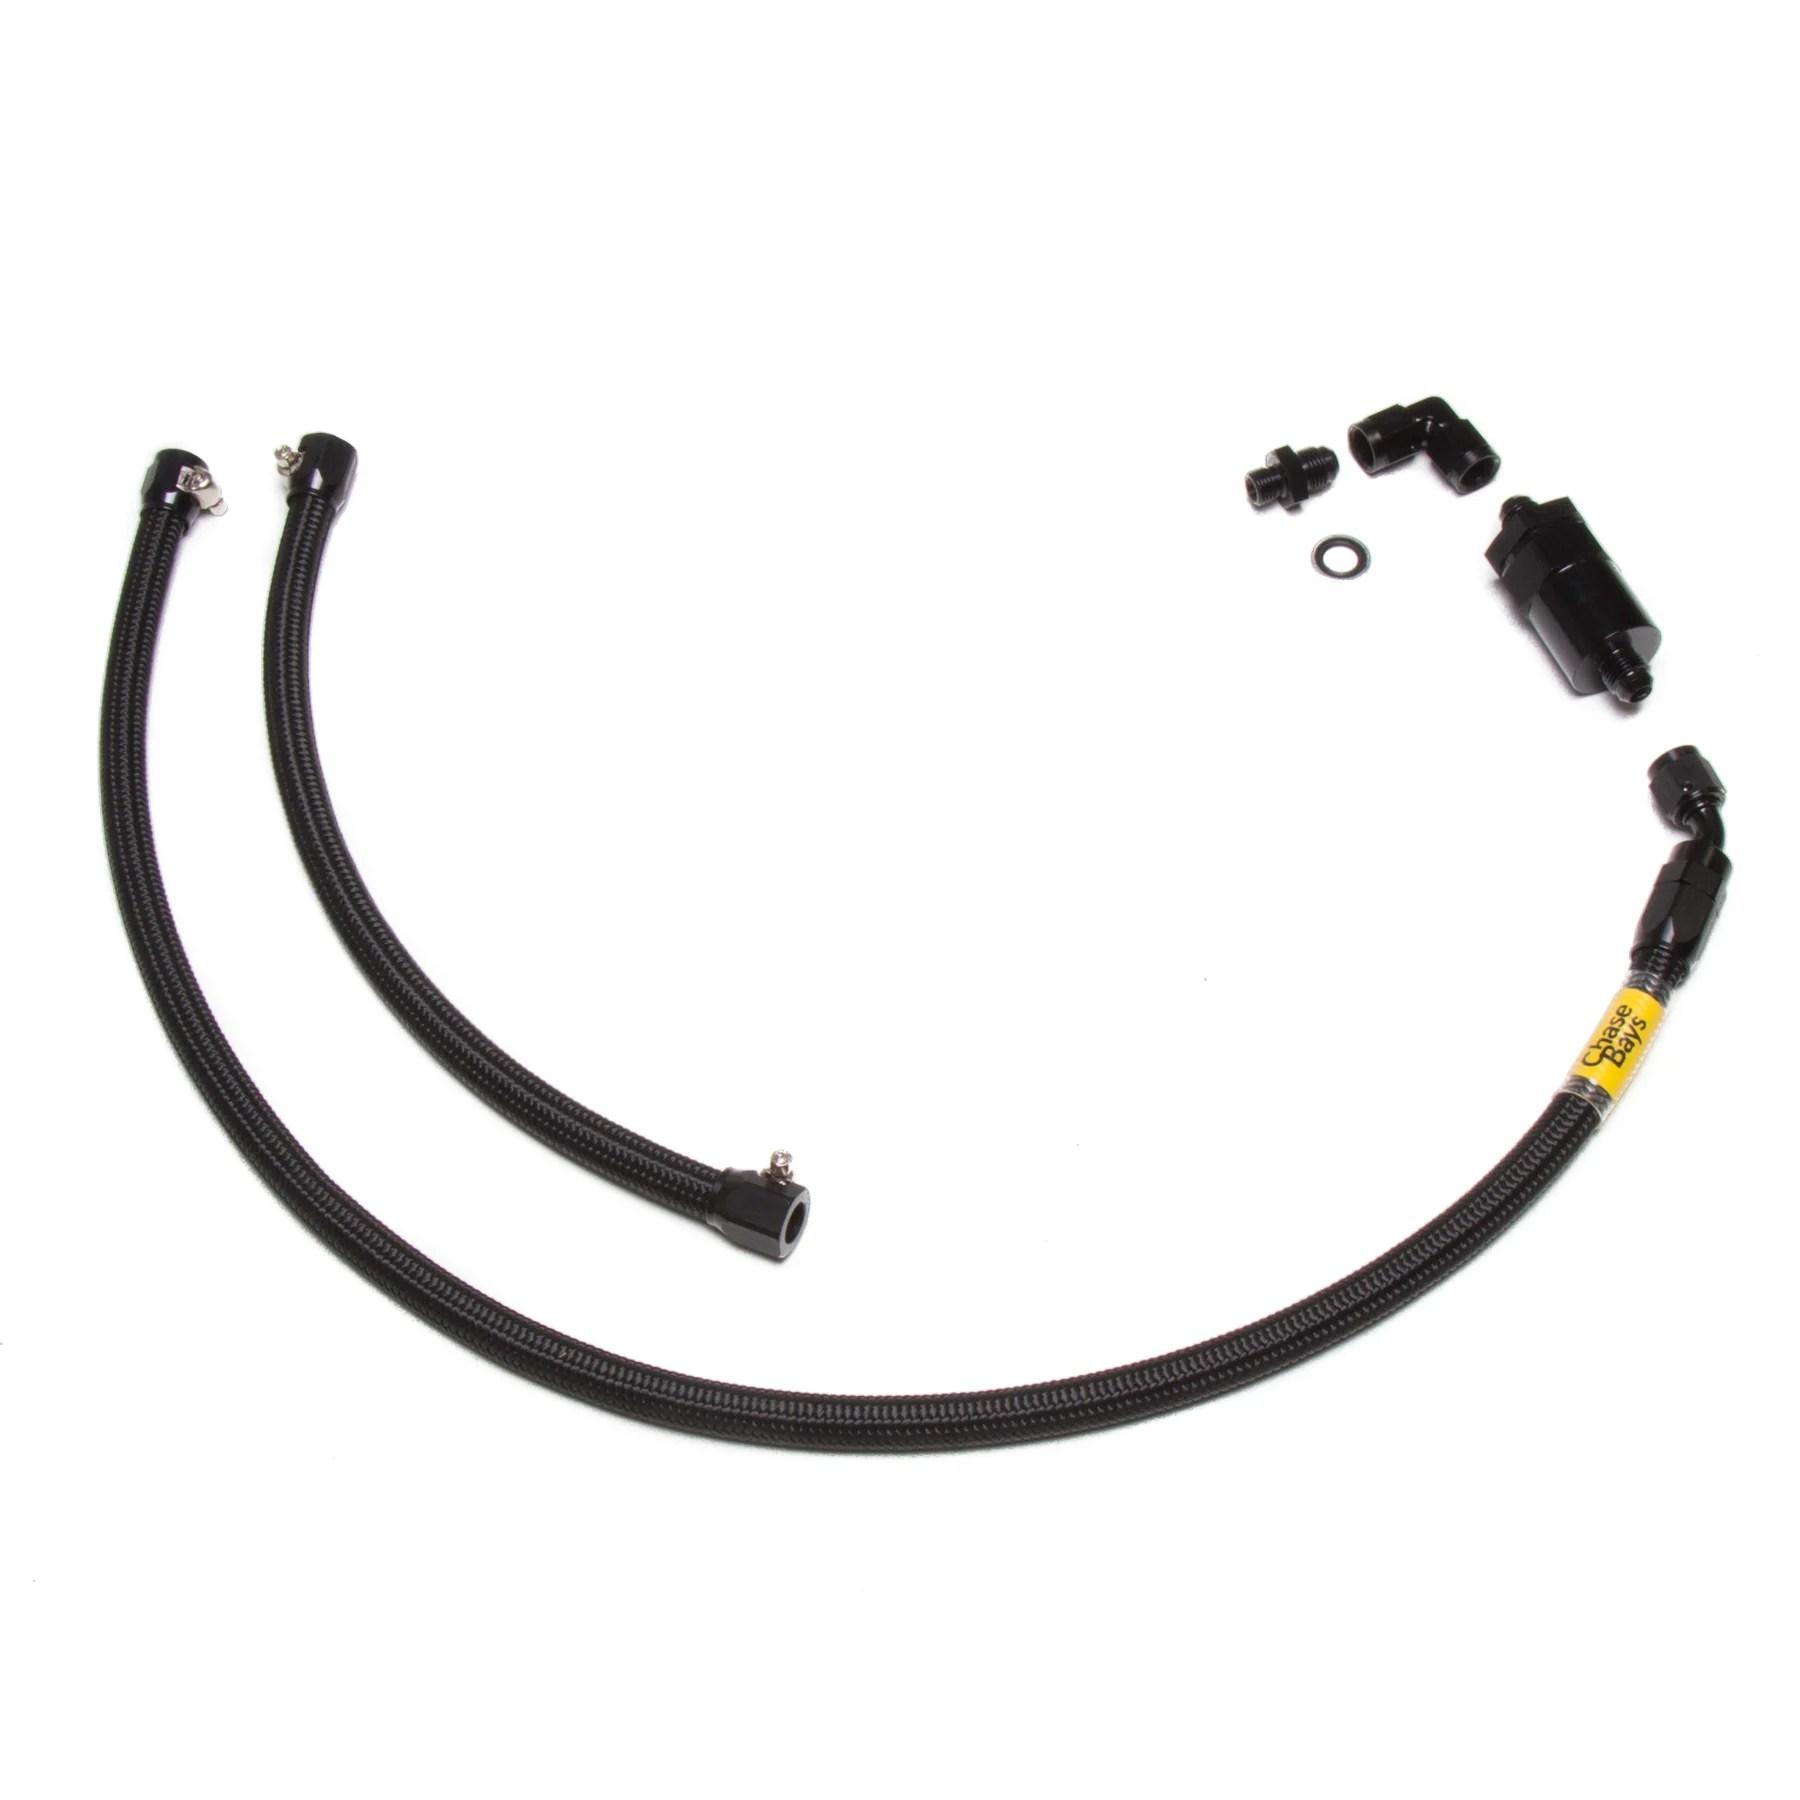 medium resolution of chase bays fuel line kit 92 00 civic 94 01 integra w b d h series